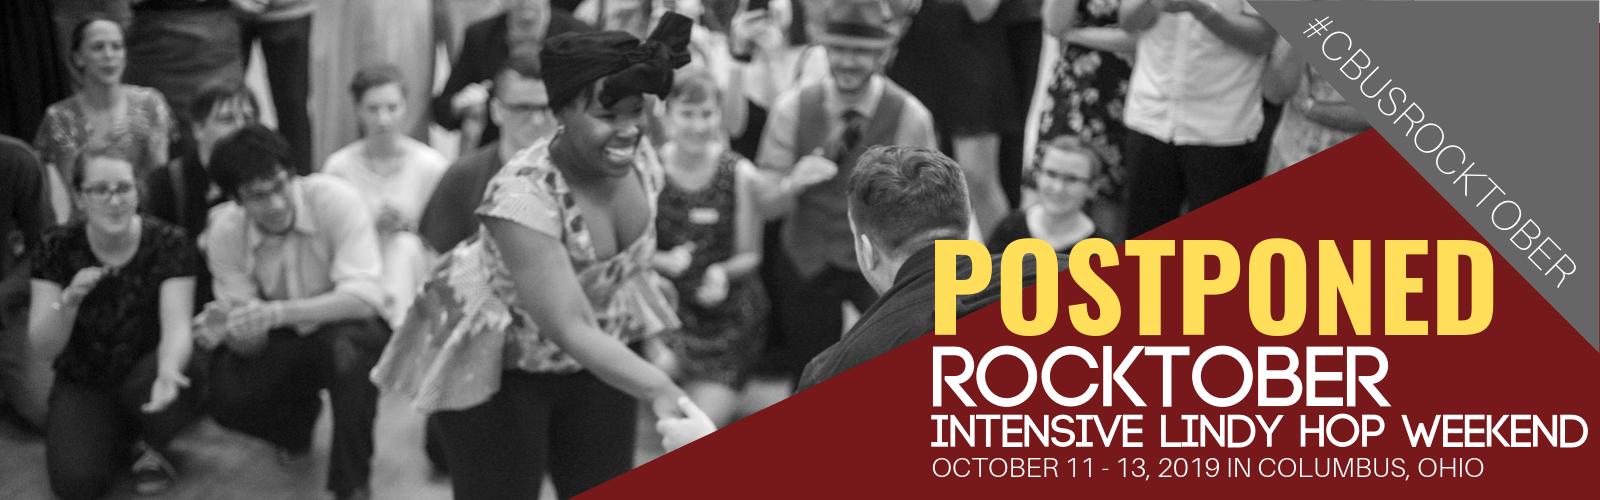 Rocktober Intensive Lindy Hop Weekend